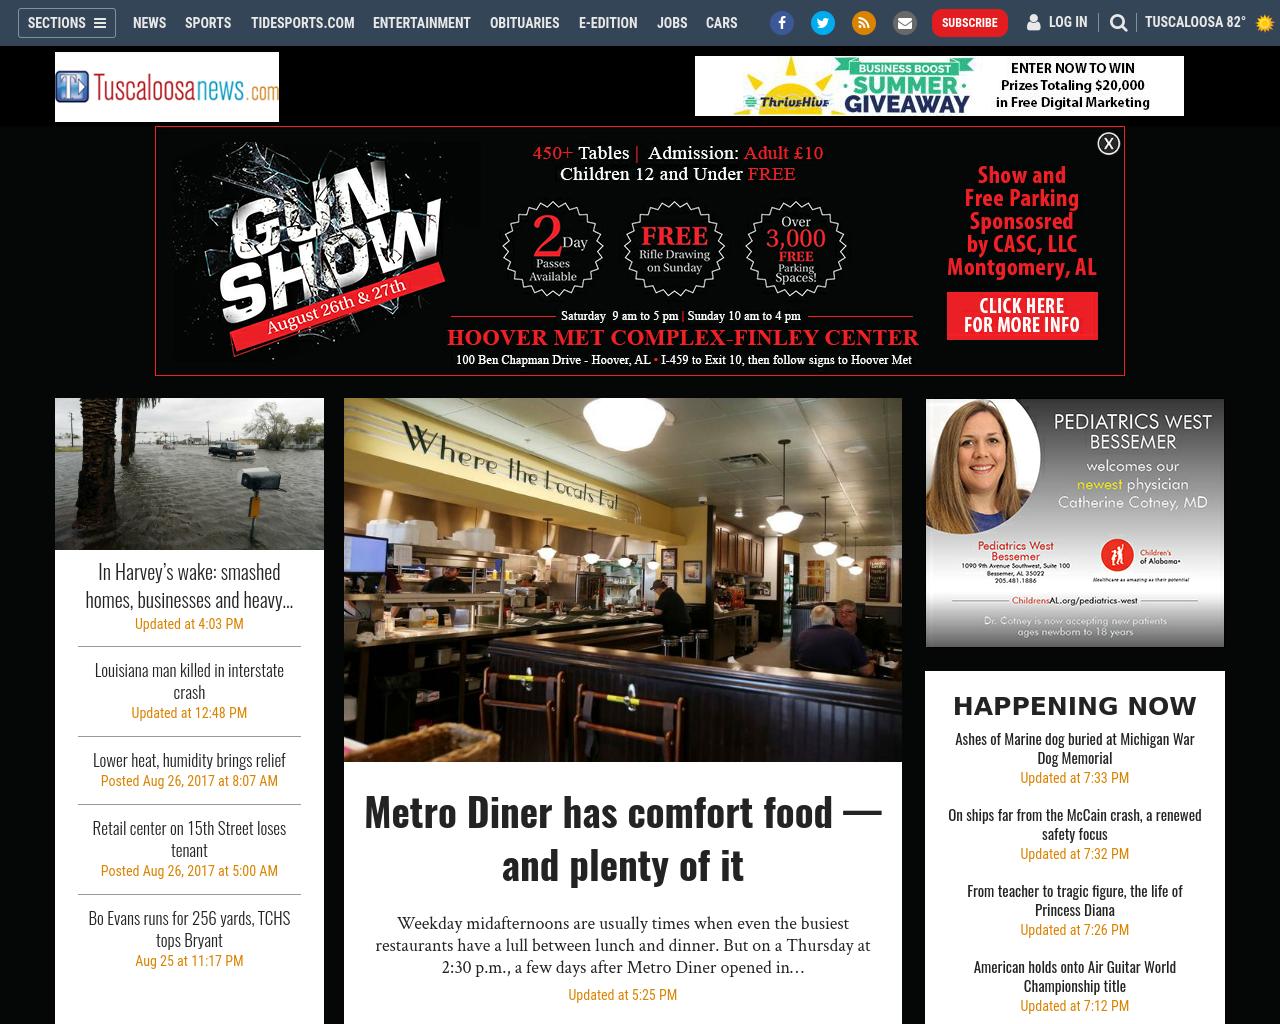 Tuscaloosa-News-Advertising-Reviews-Pricing